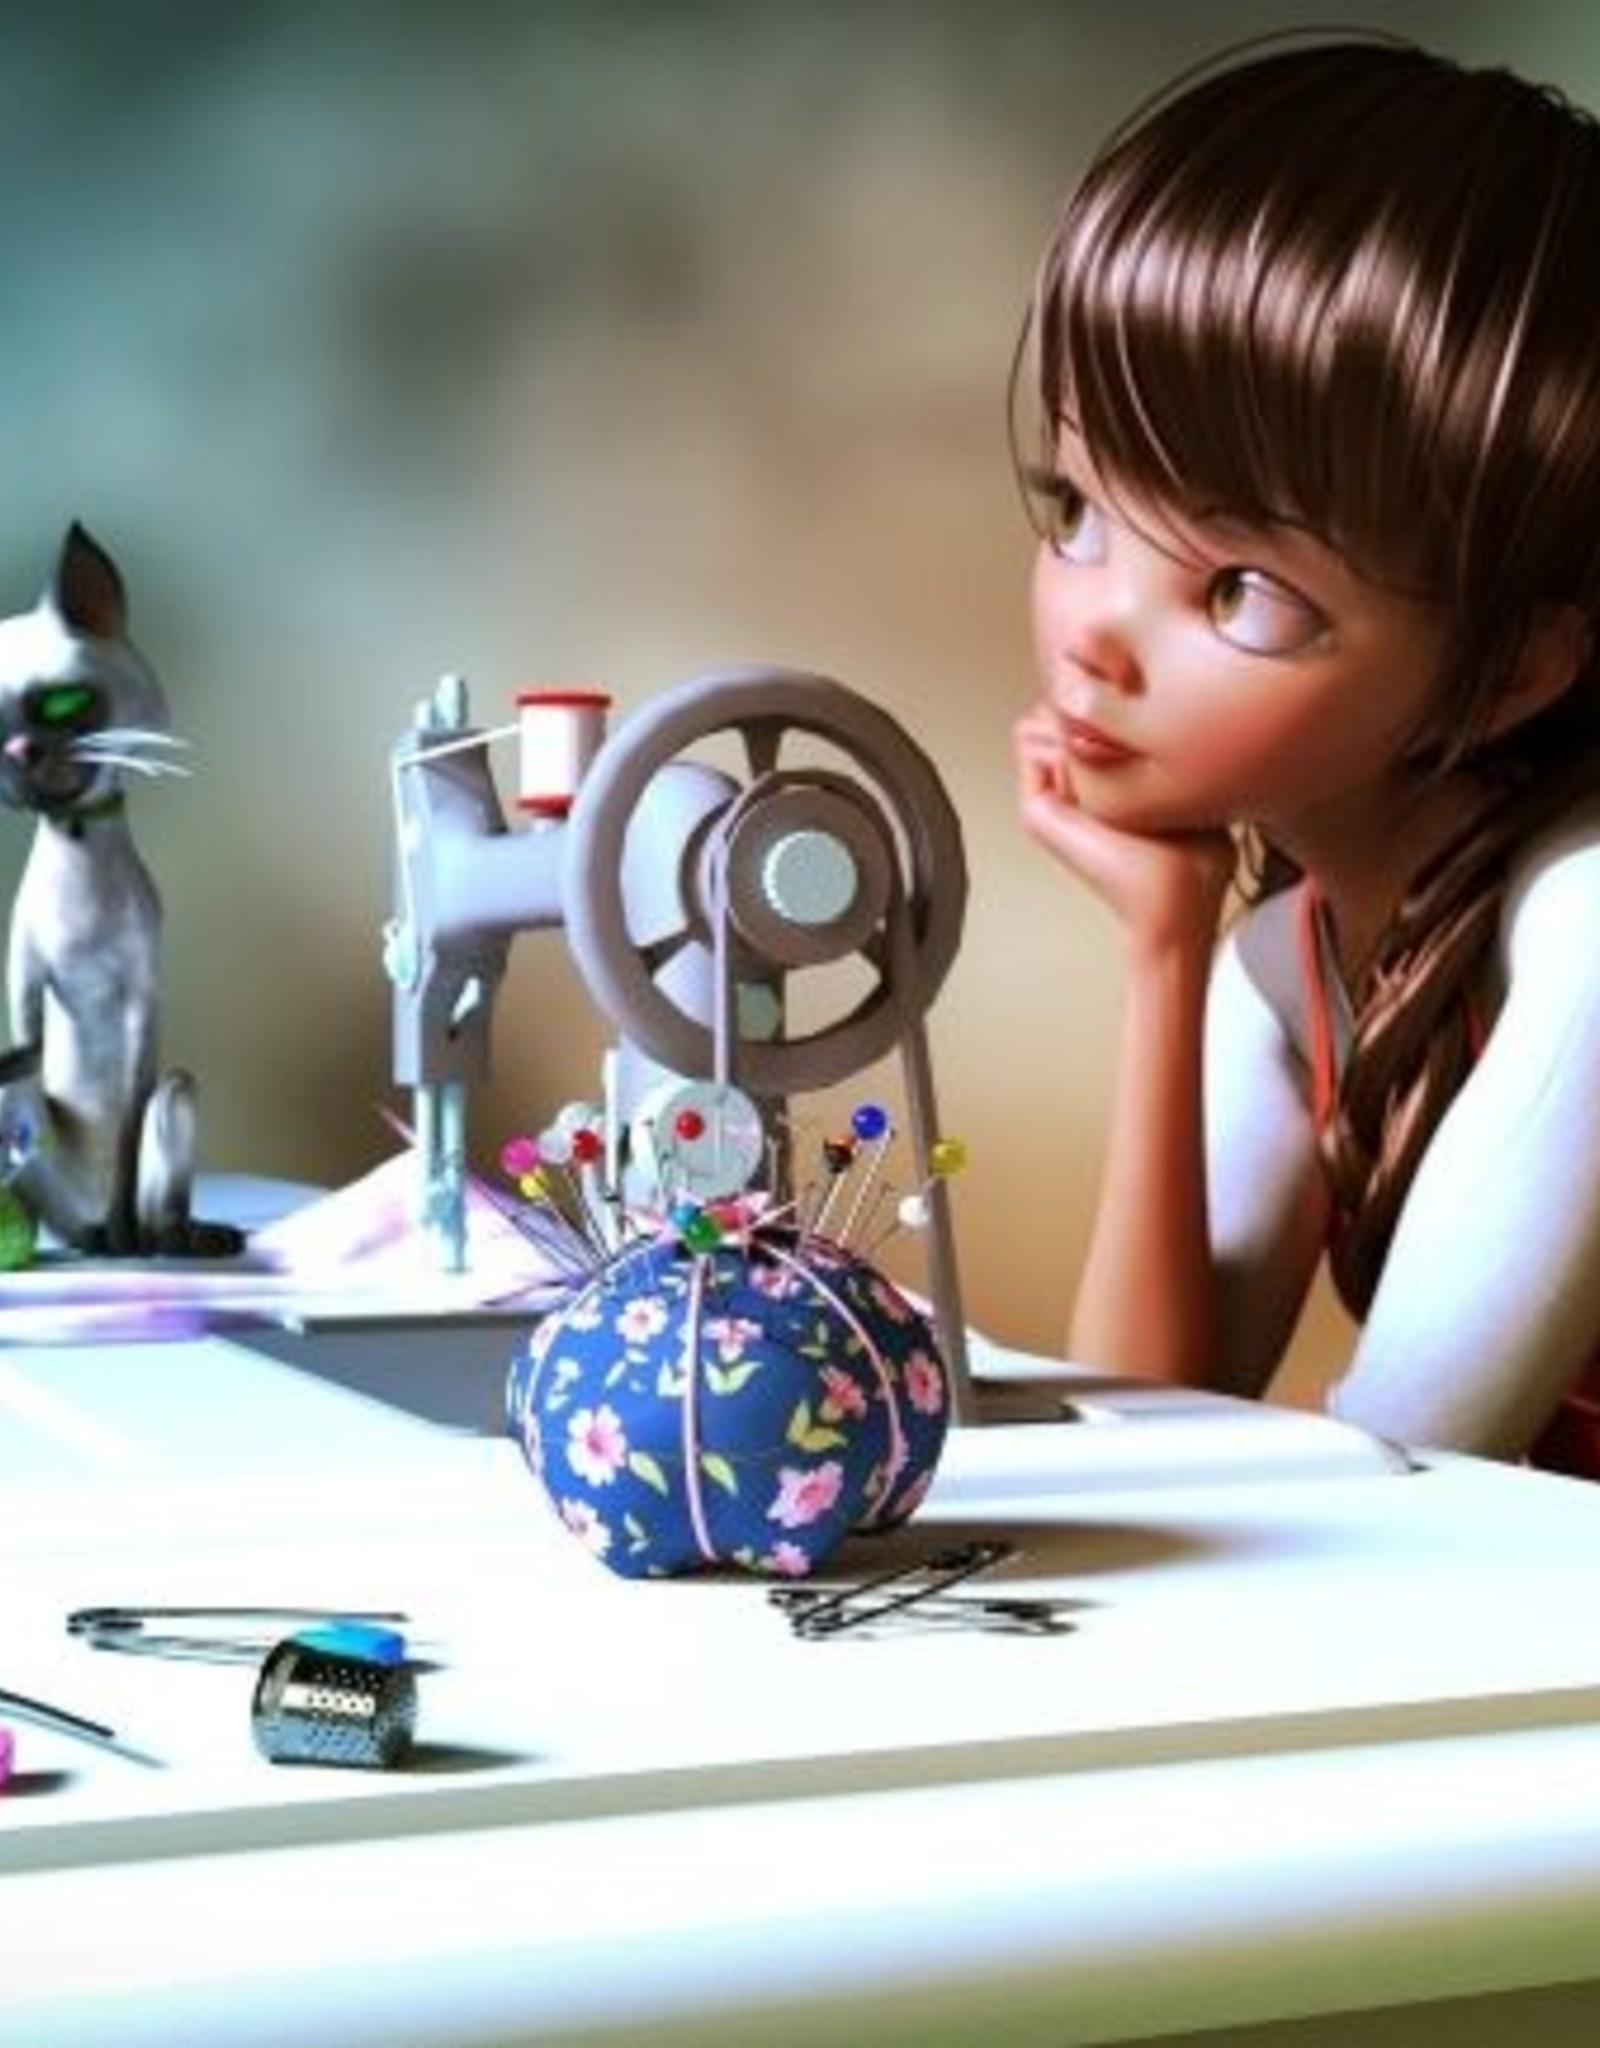 Fibre Art Class Kids/Youth Sewing  Level 1 Sun Feb 14  to Sun March 7